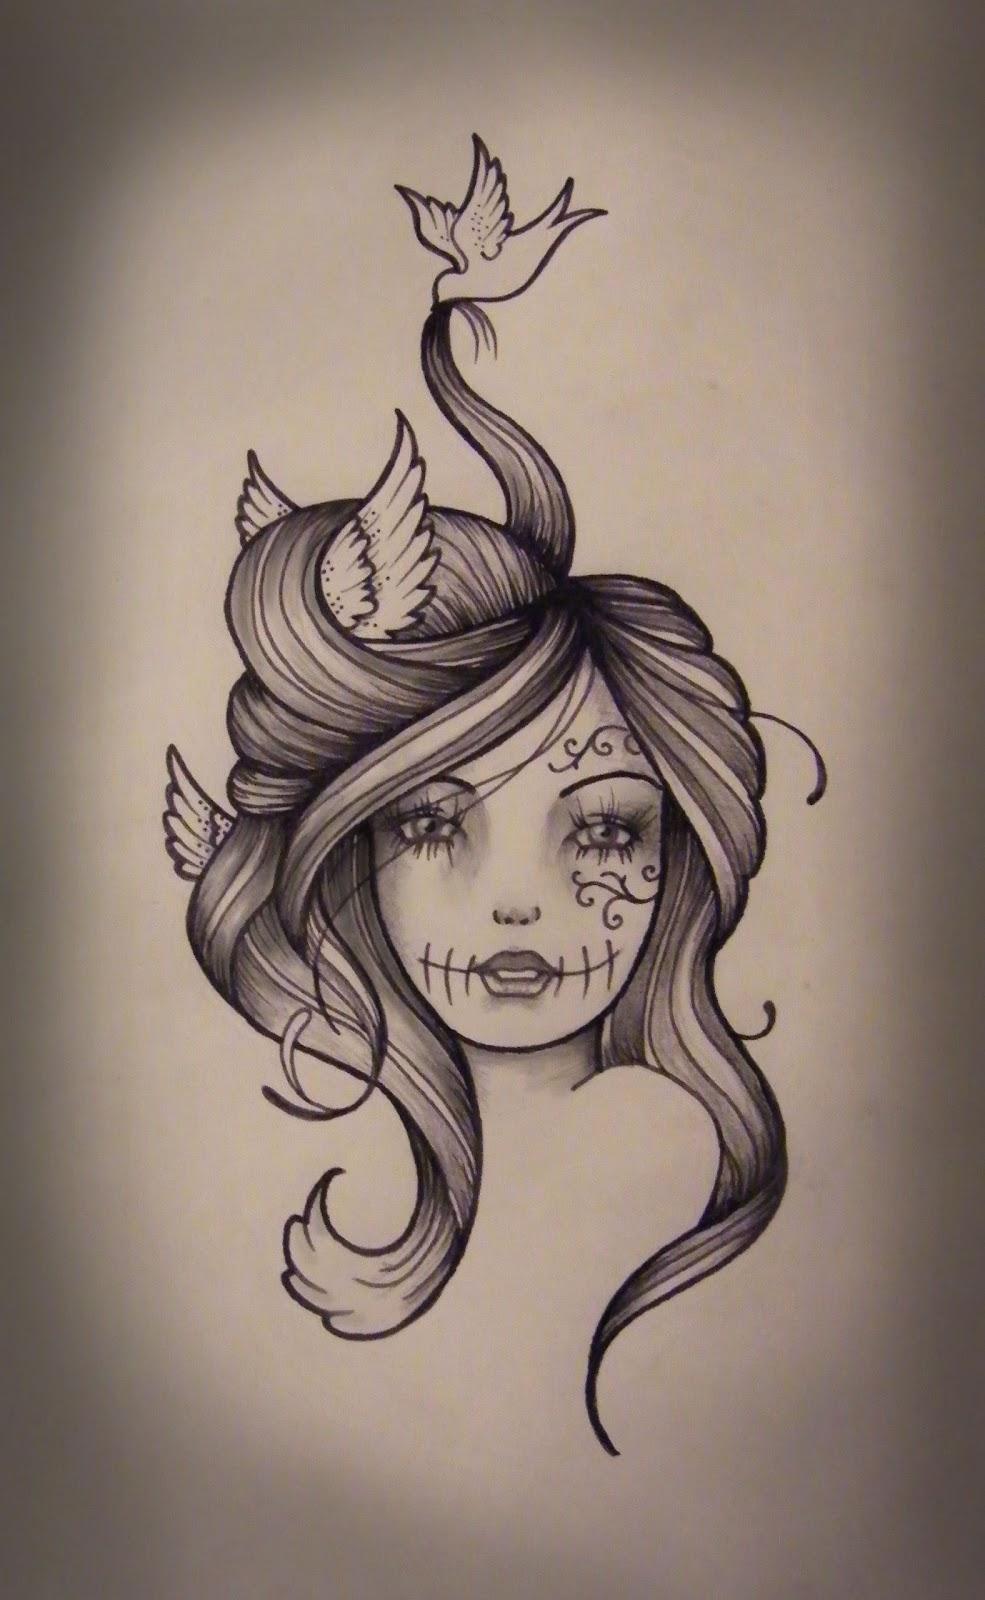 Girl tattoo designs wrist